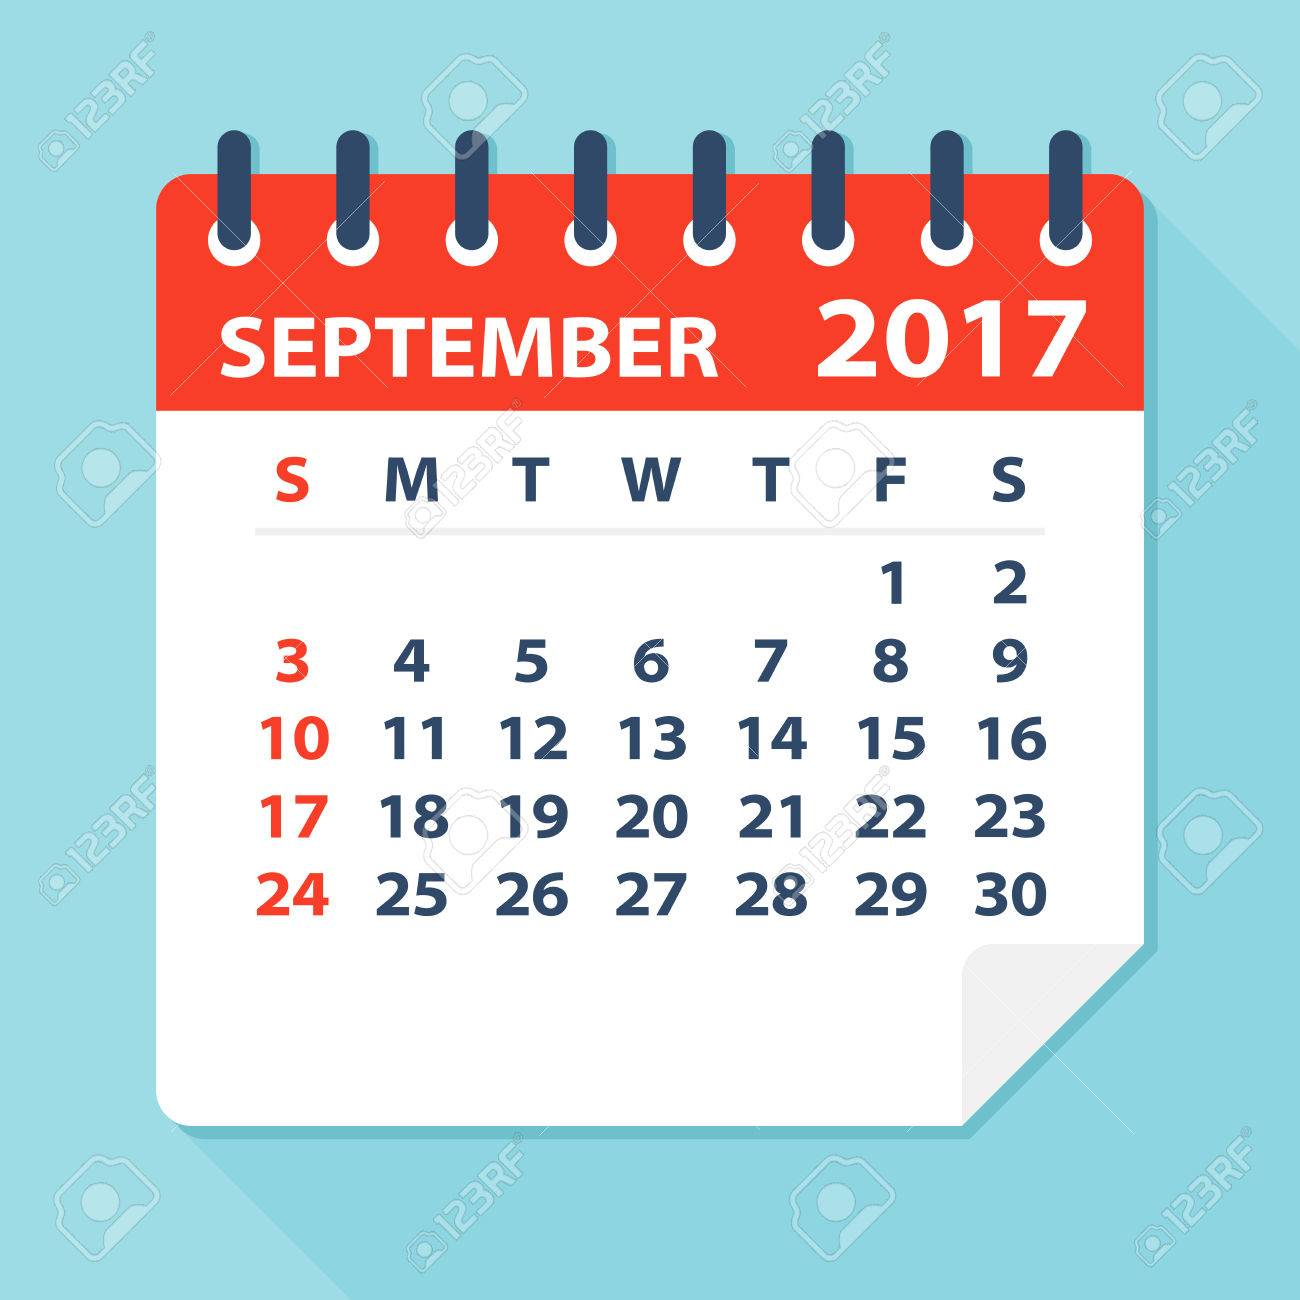 September 2017 Calendar.